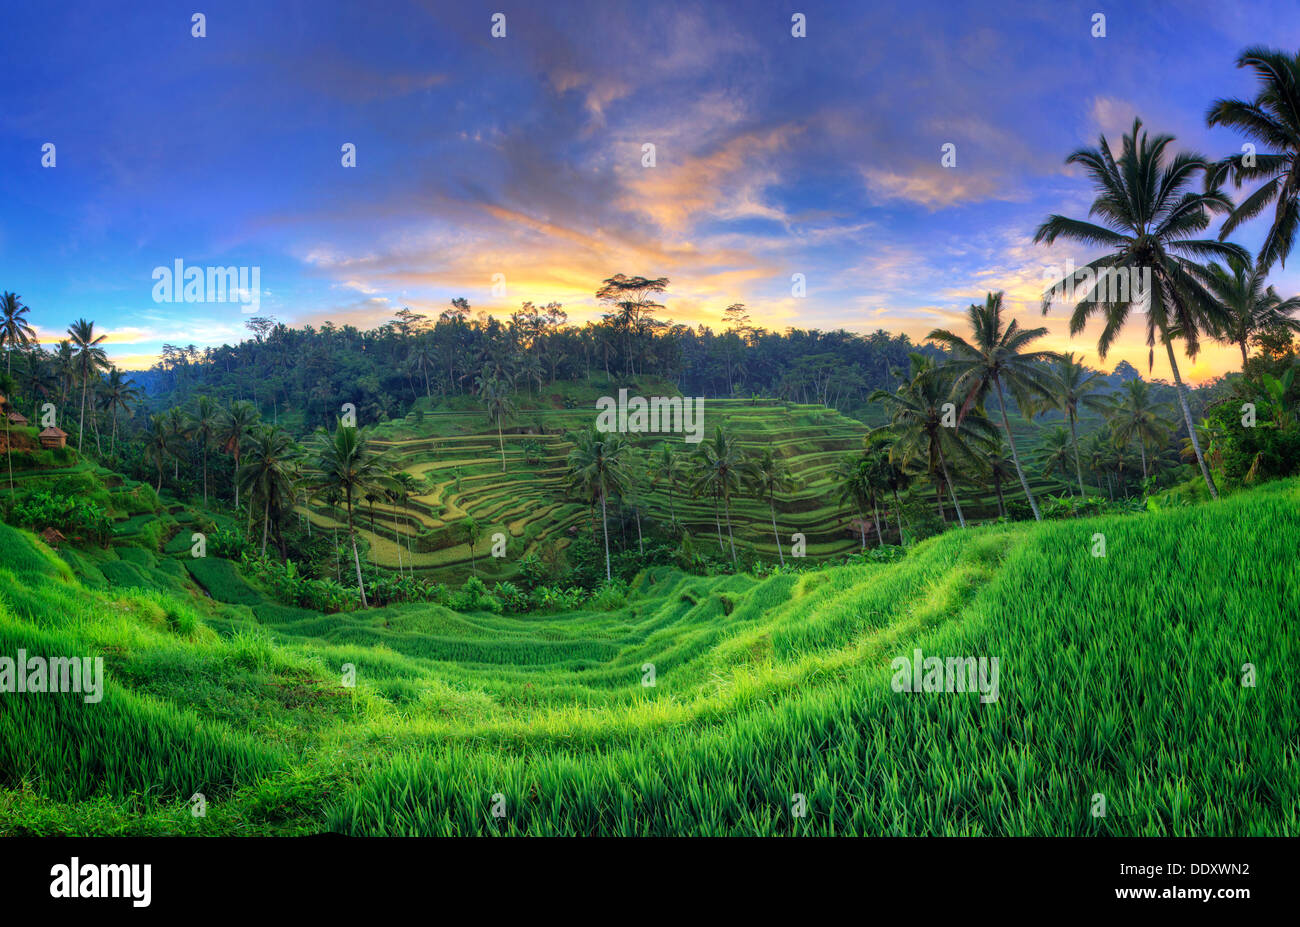 L'INDONÉSIE, Bali, Ubud, Ceking Rice Terraces Photo Stock